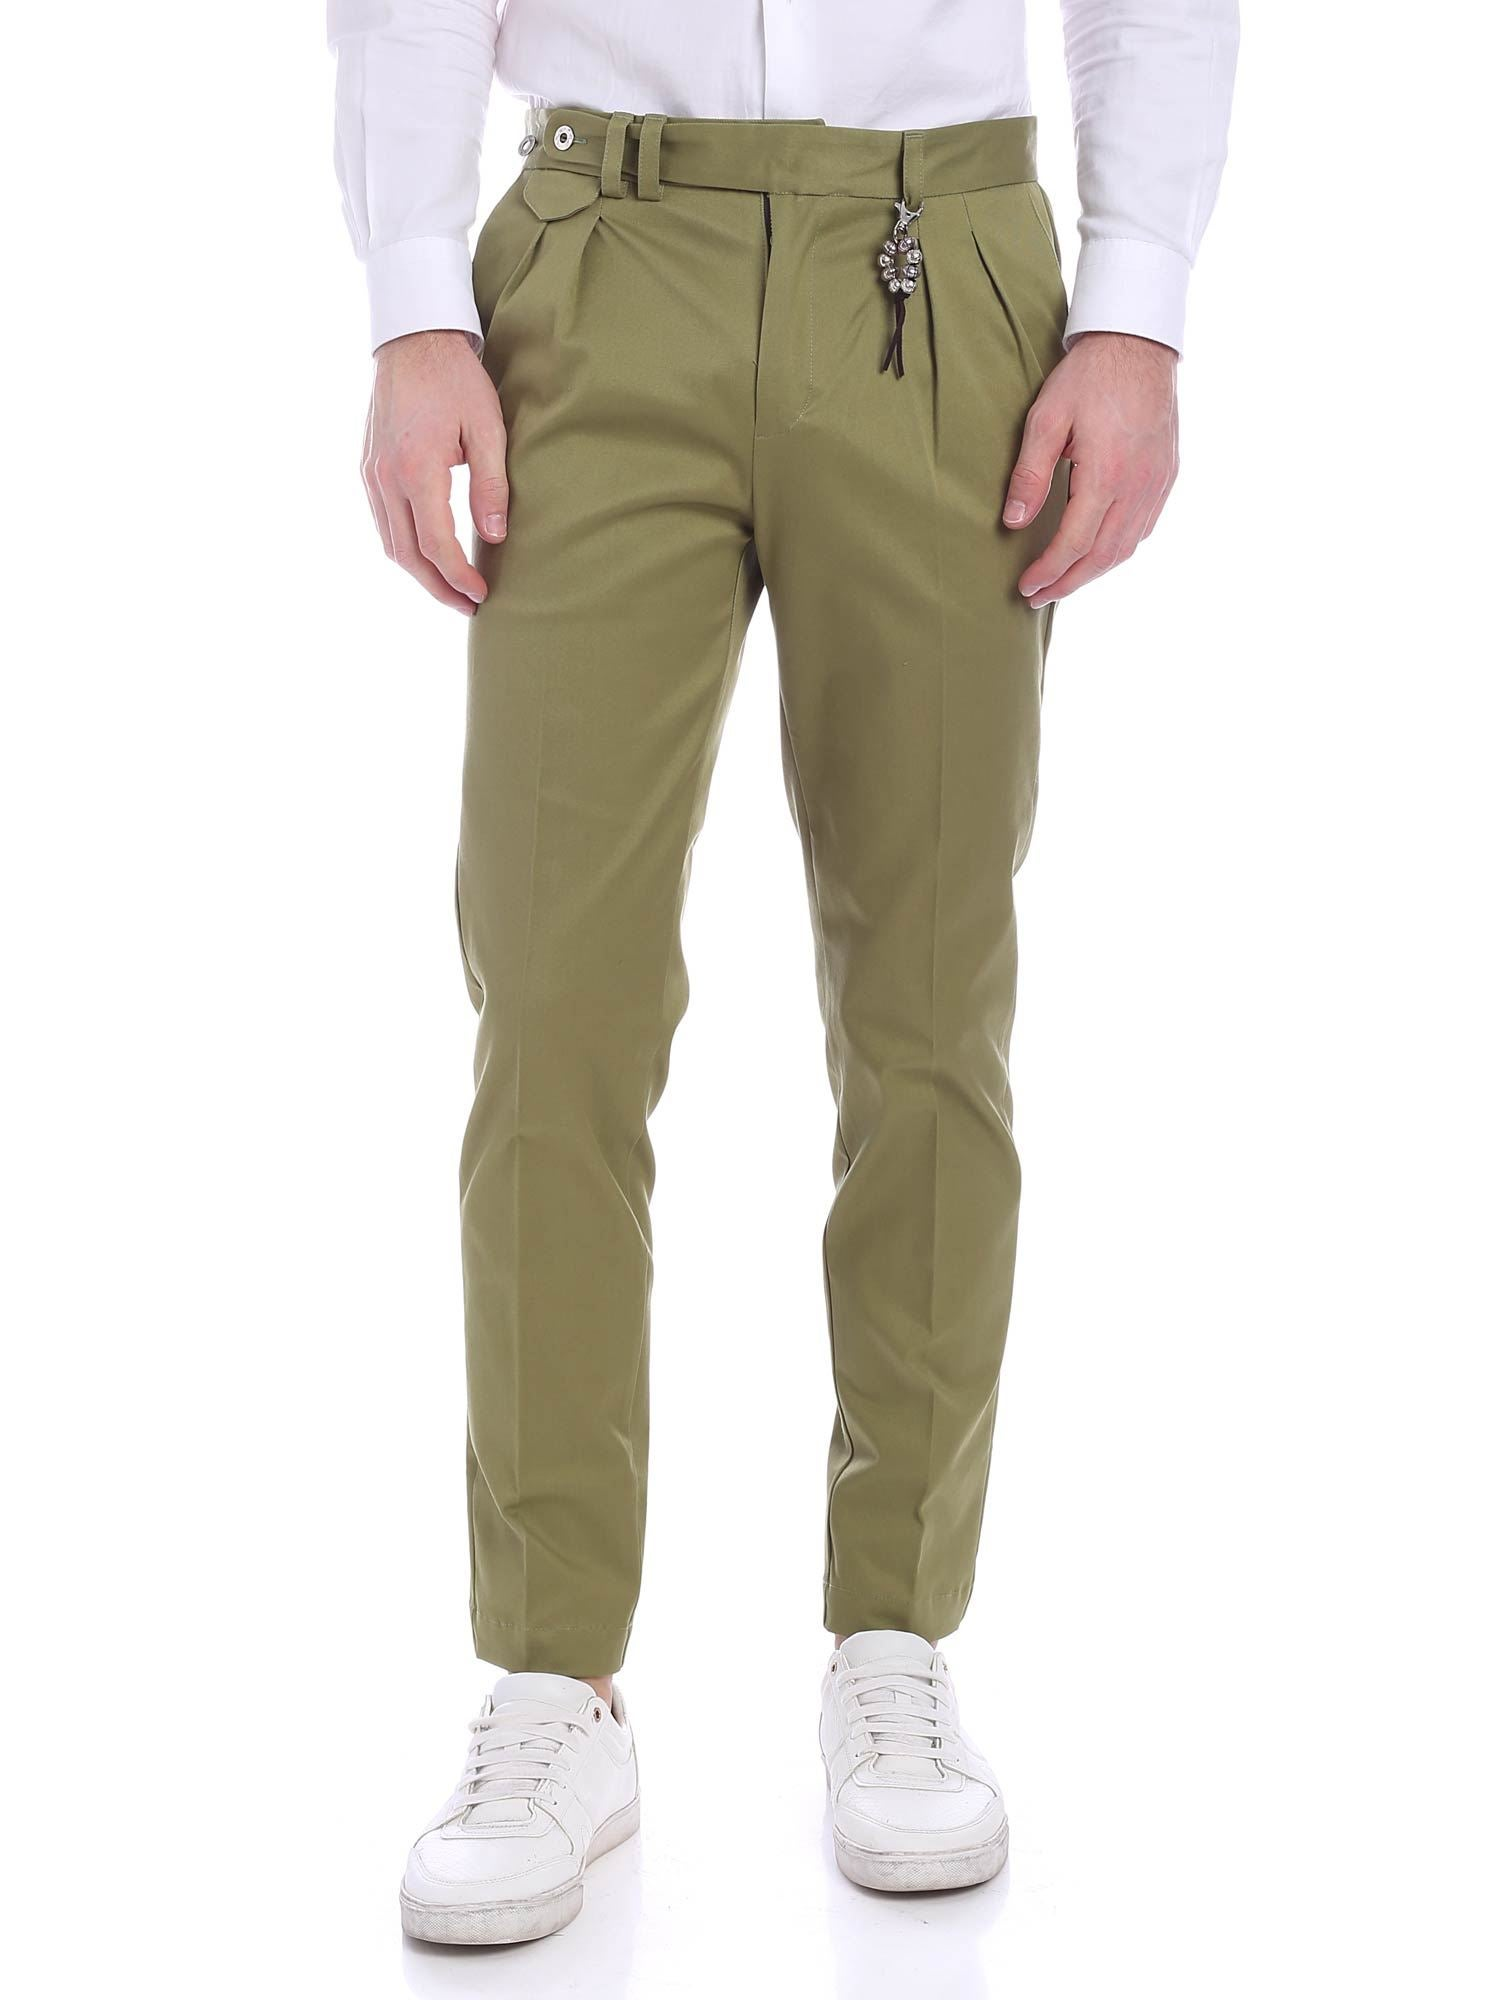 Image of Pantalone doppia pences verde R96 C-V